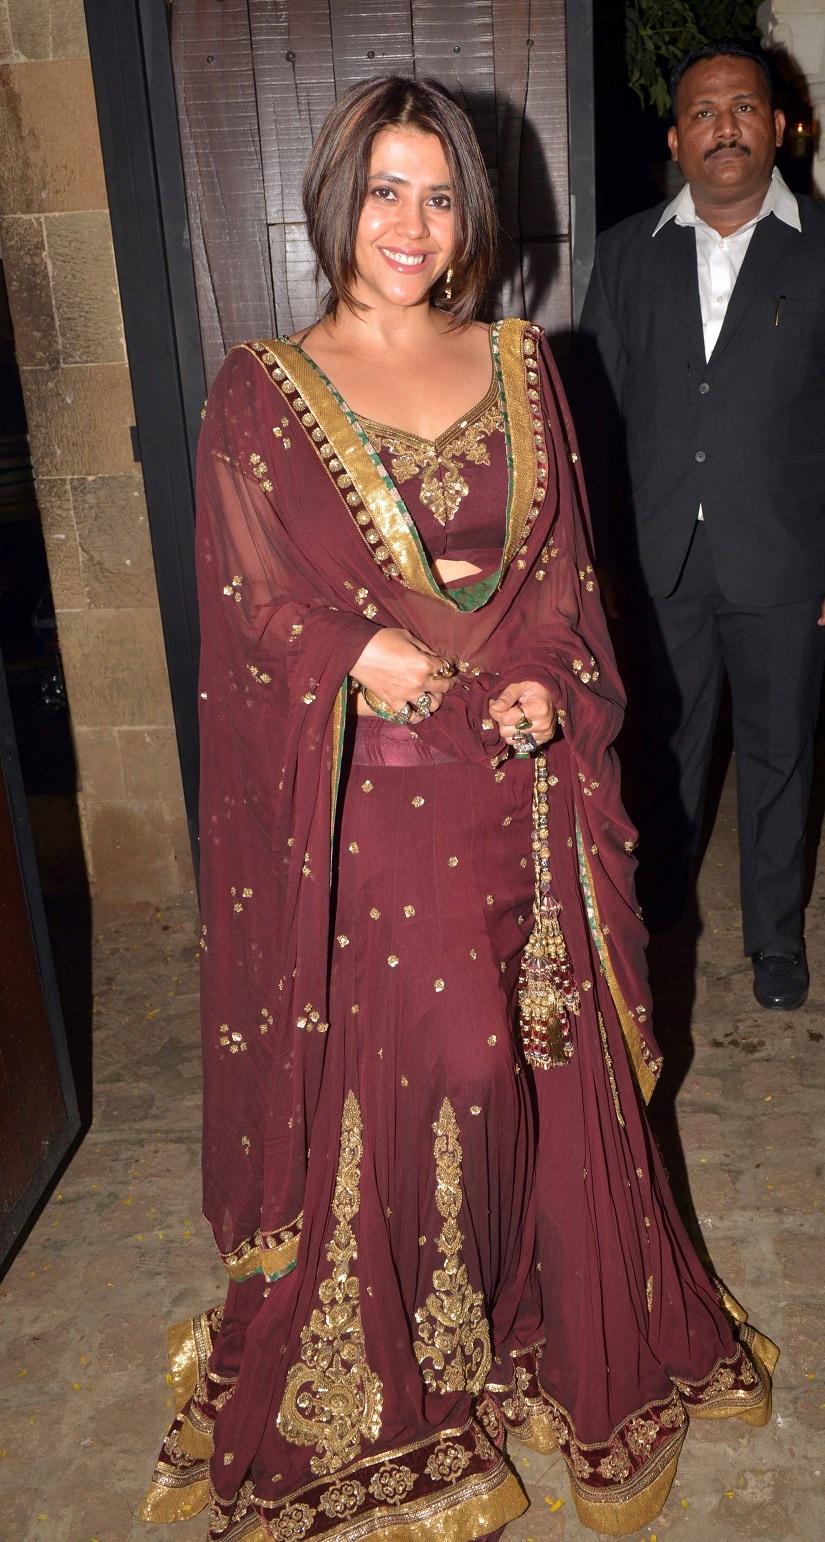 Ekta Kapoor. Image by Firstpost/Sachin Gokhale.